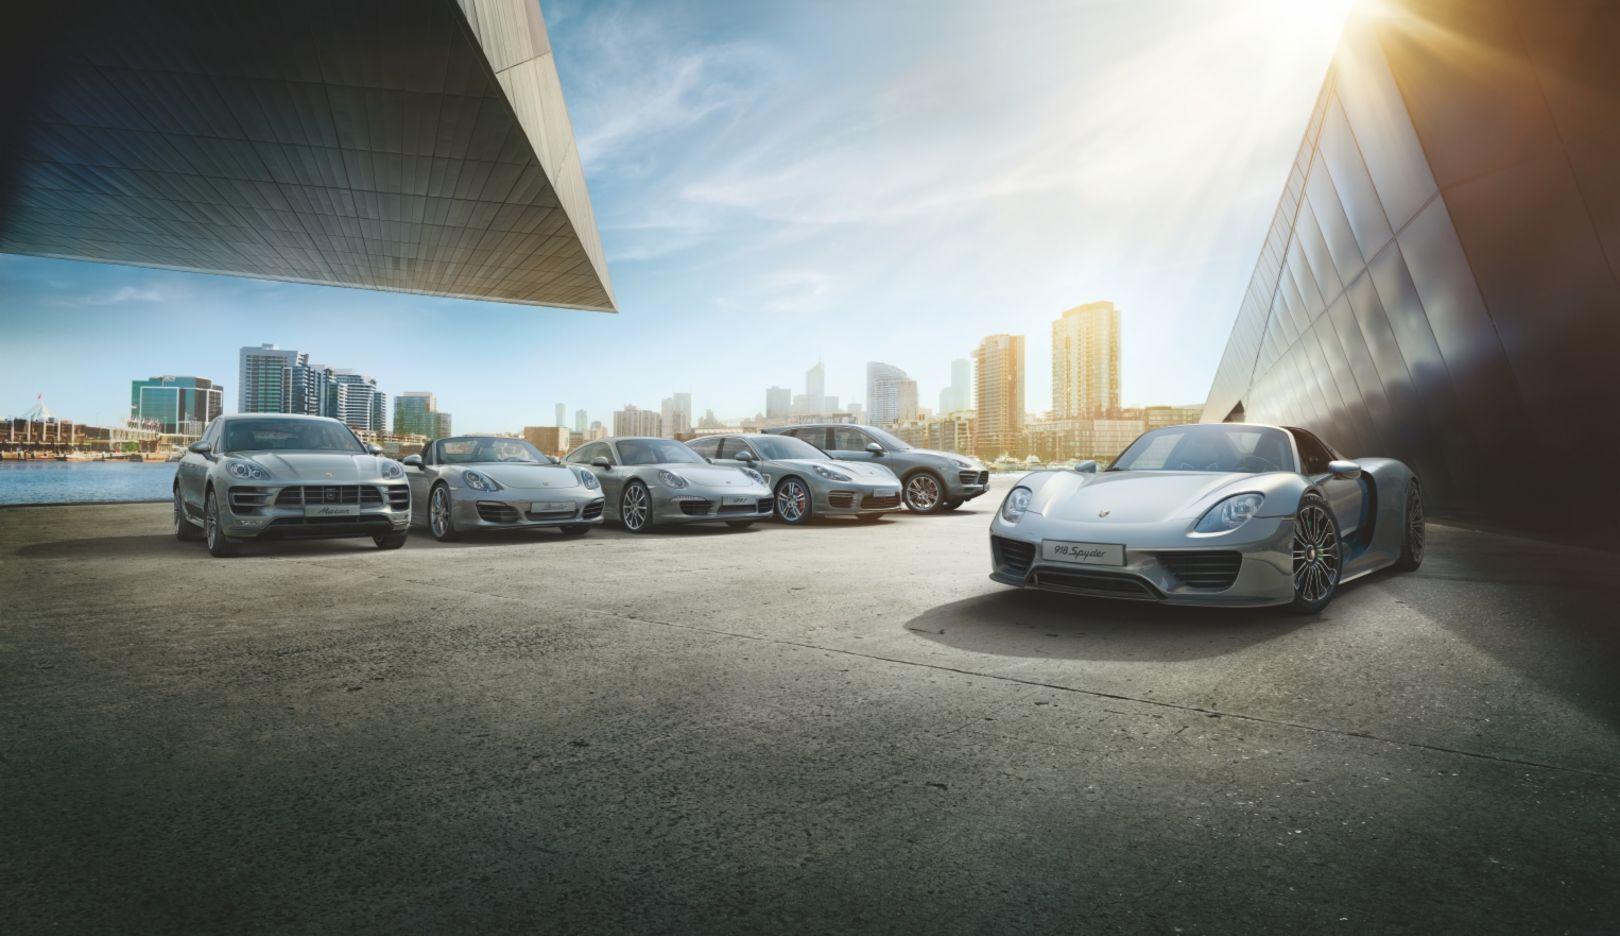 918 Spyder, Macan, Boxster, 911, Panamera, Cayenne, 2014, Porsche AG